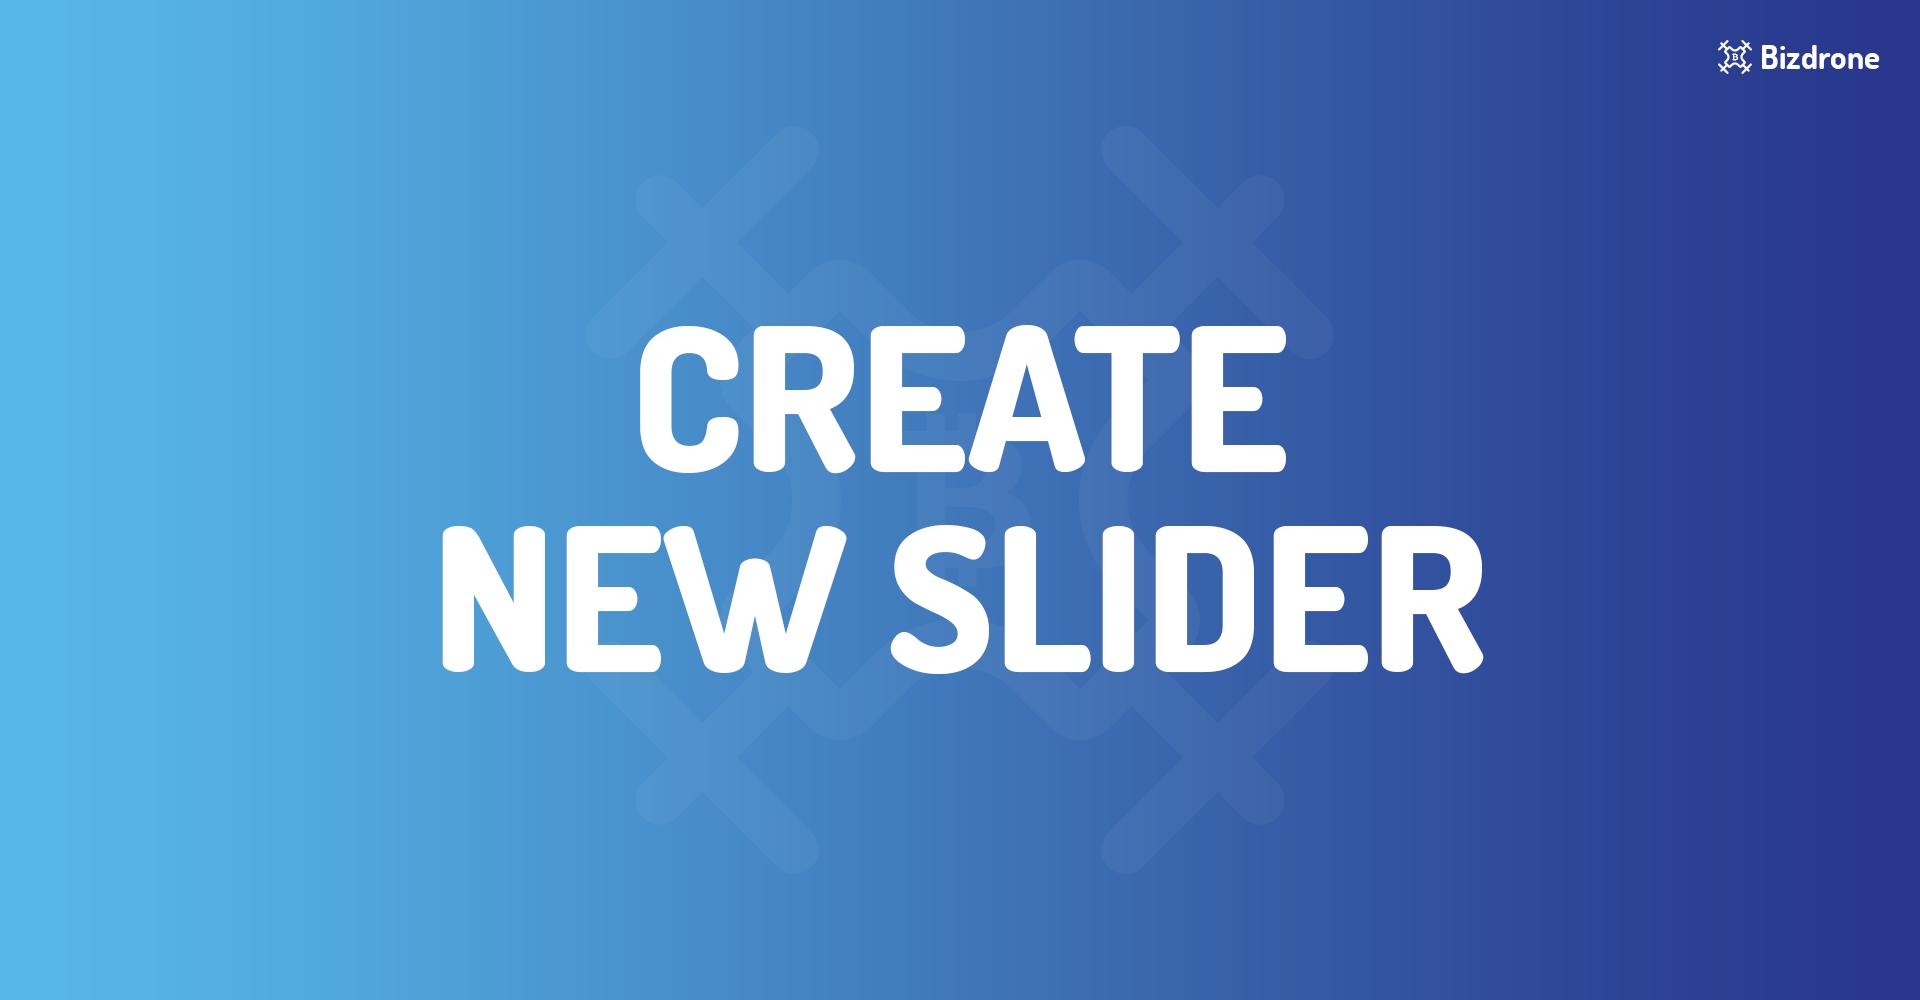 CREATE NEW SLIDER